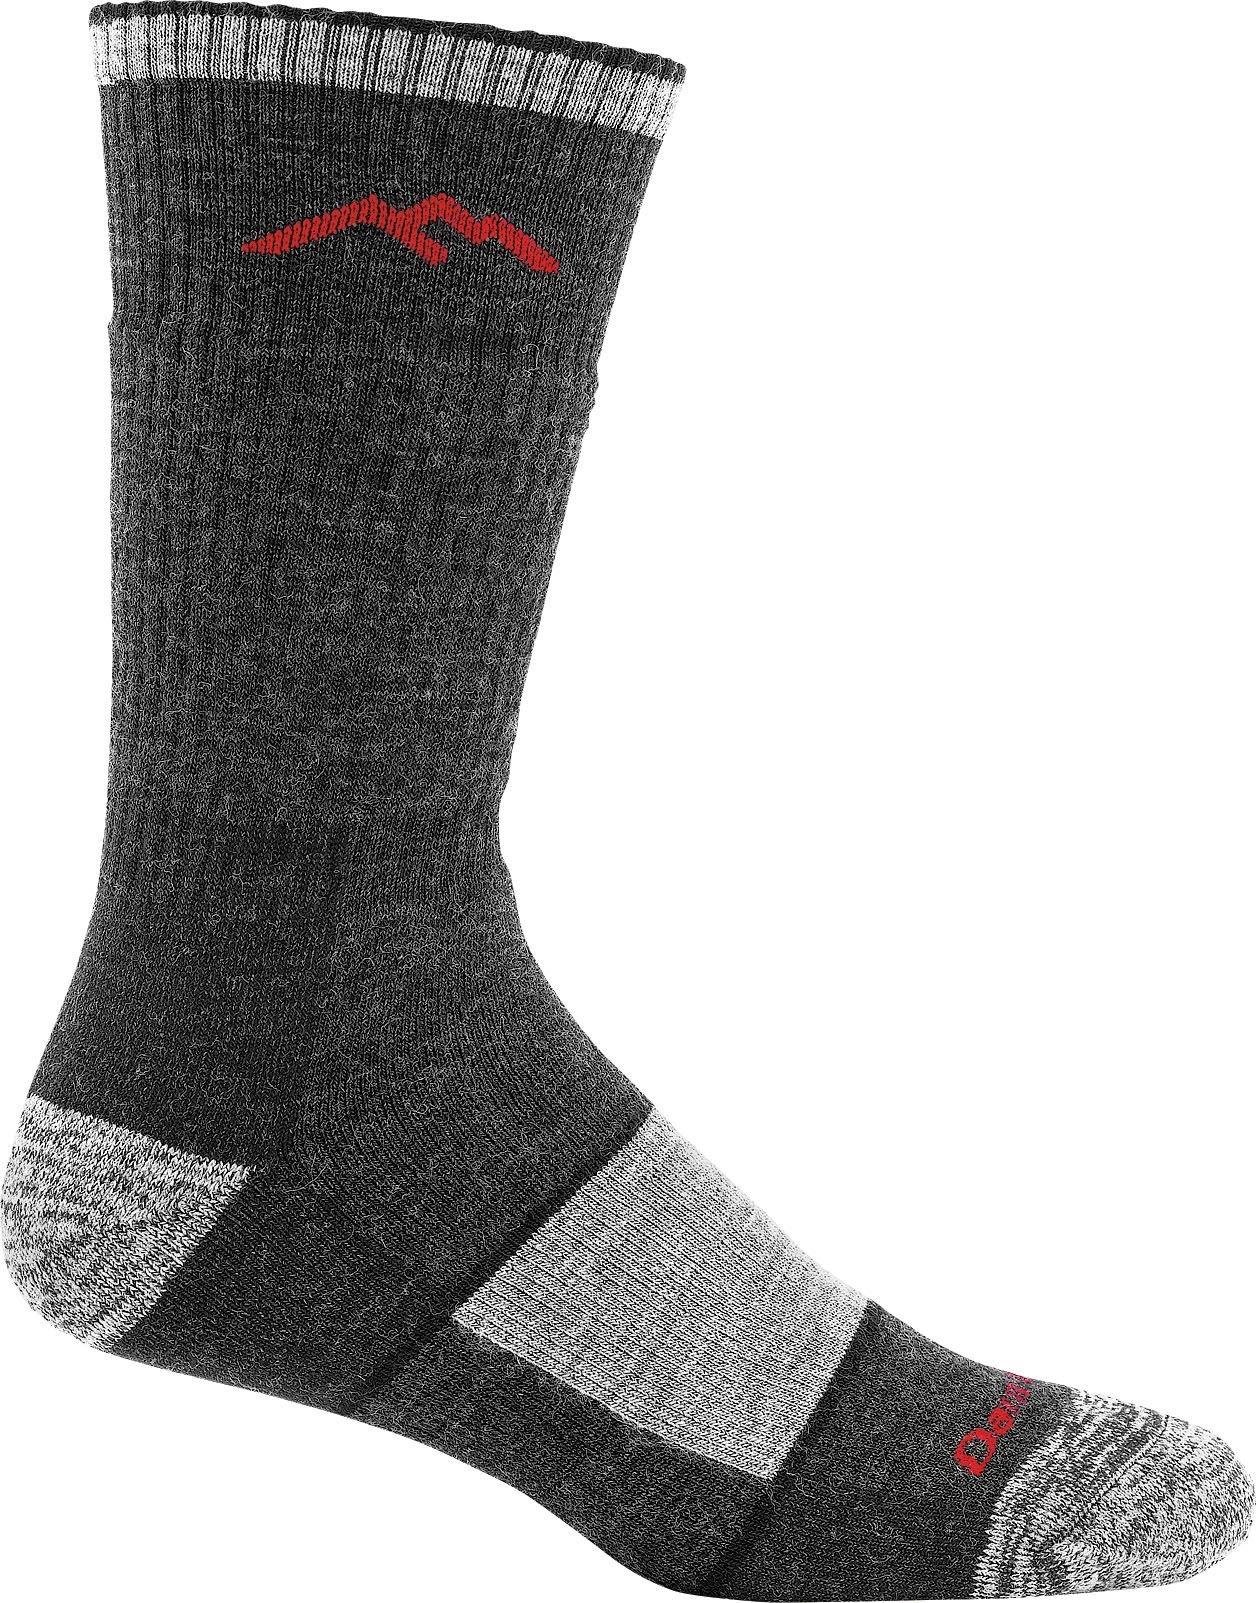 Darn Tough Merino Wool Boot Sock Full Cushion,Black,Large by Darn Tough